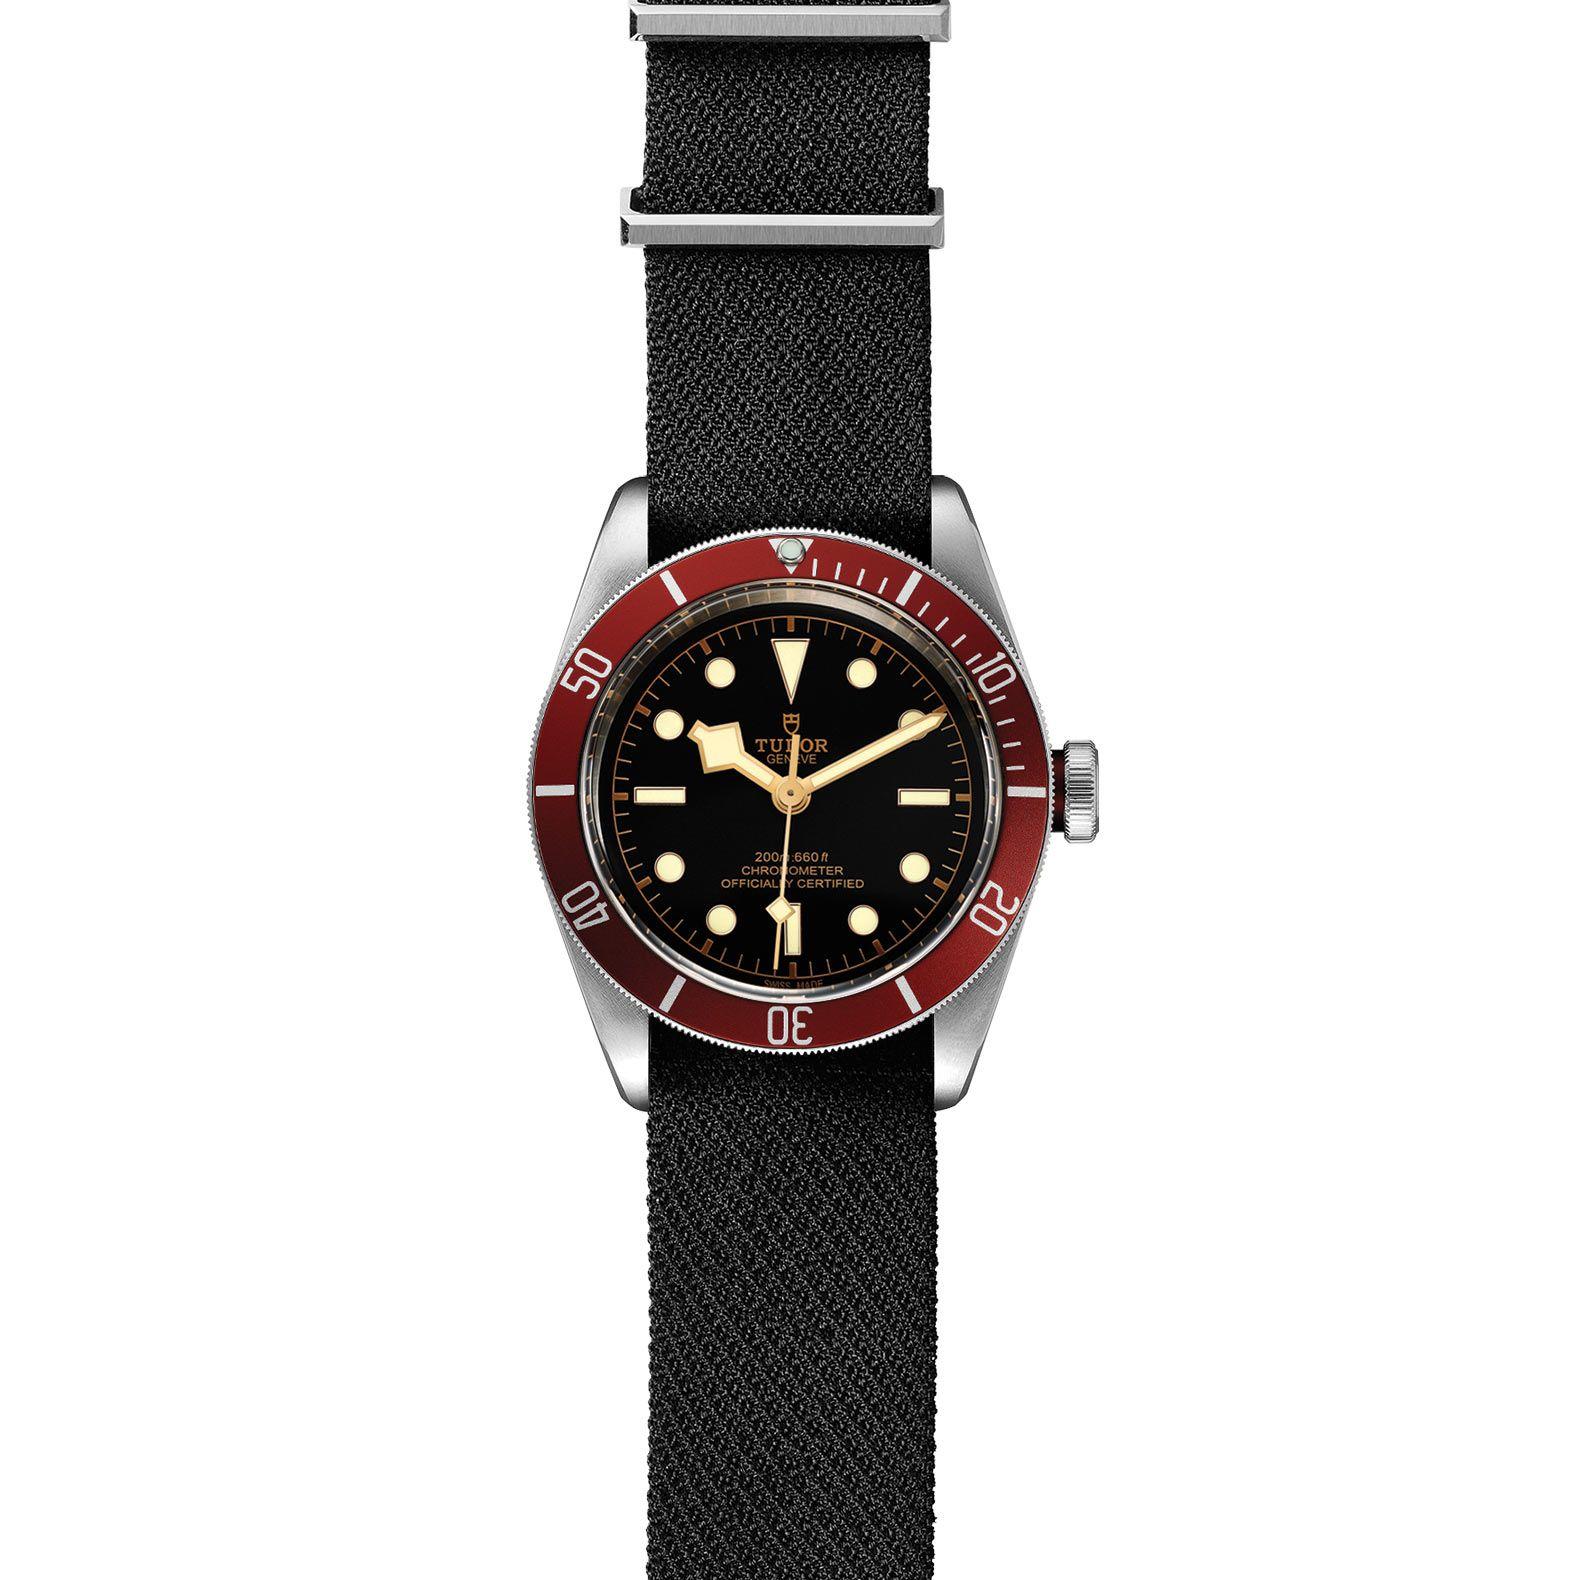 BLACK BAY 79230R - 0010